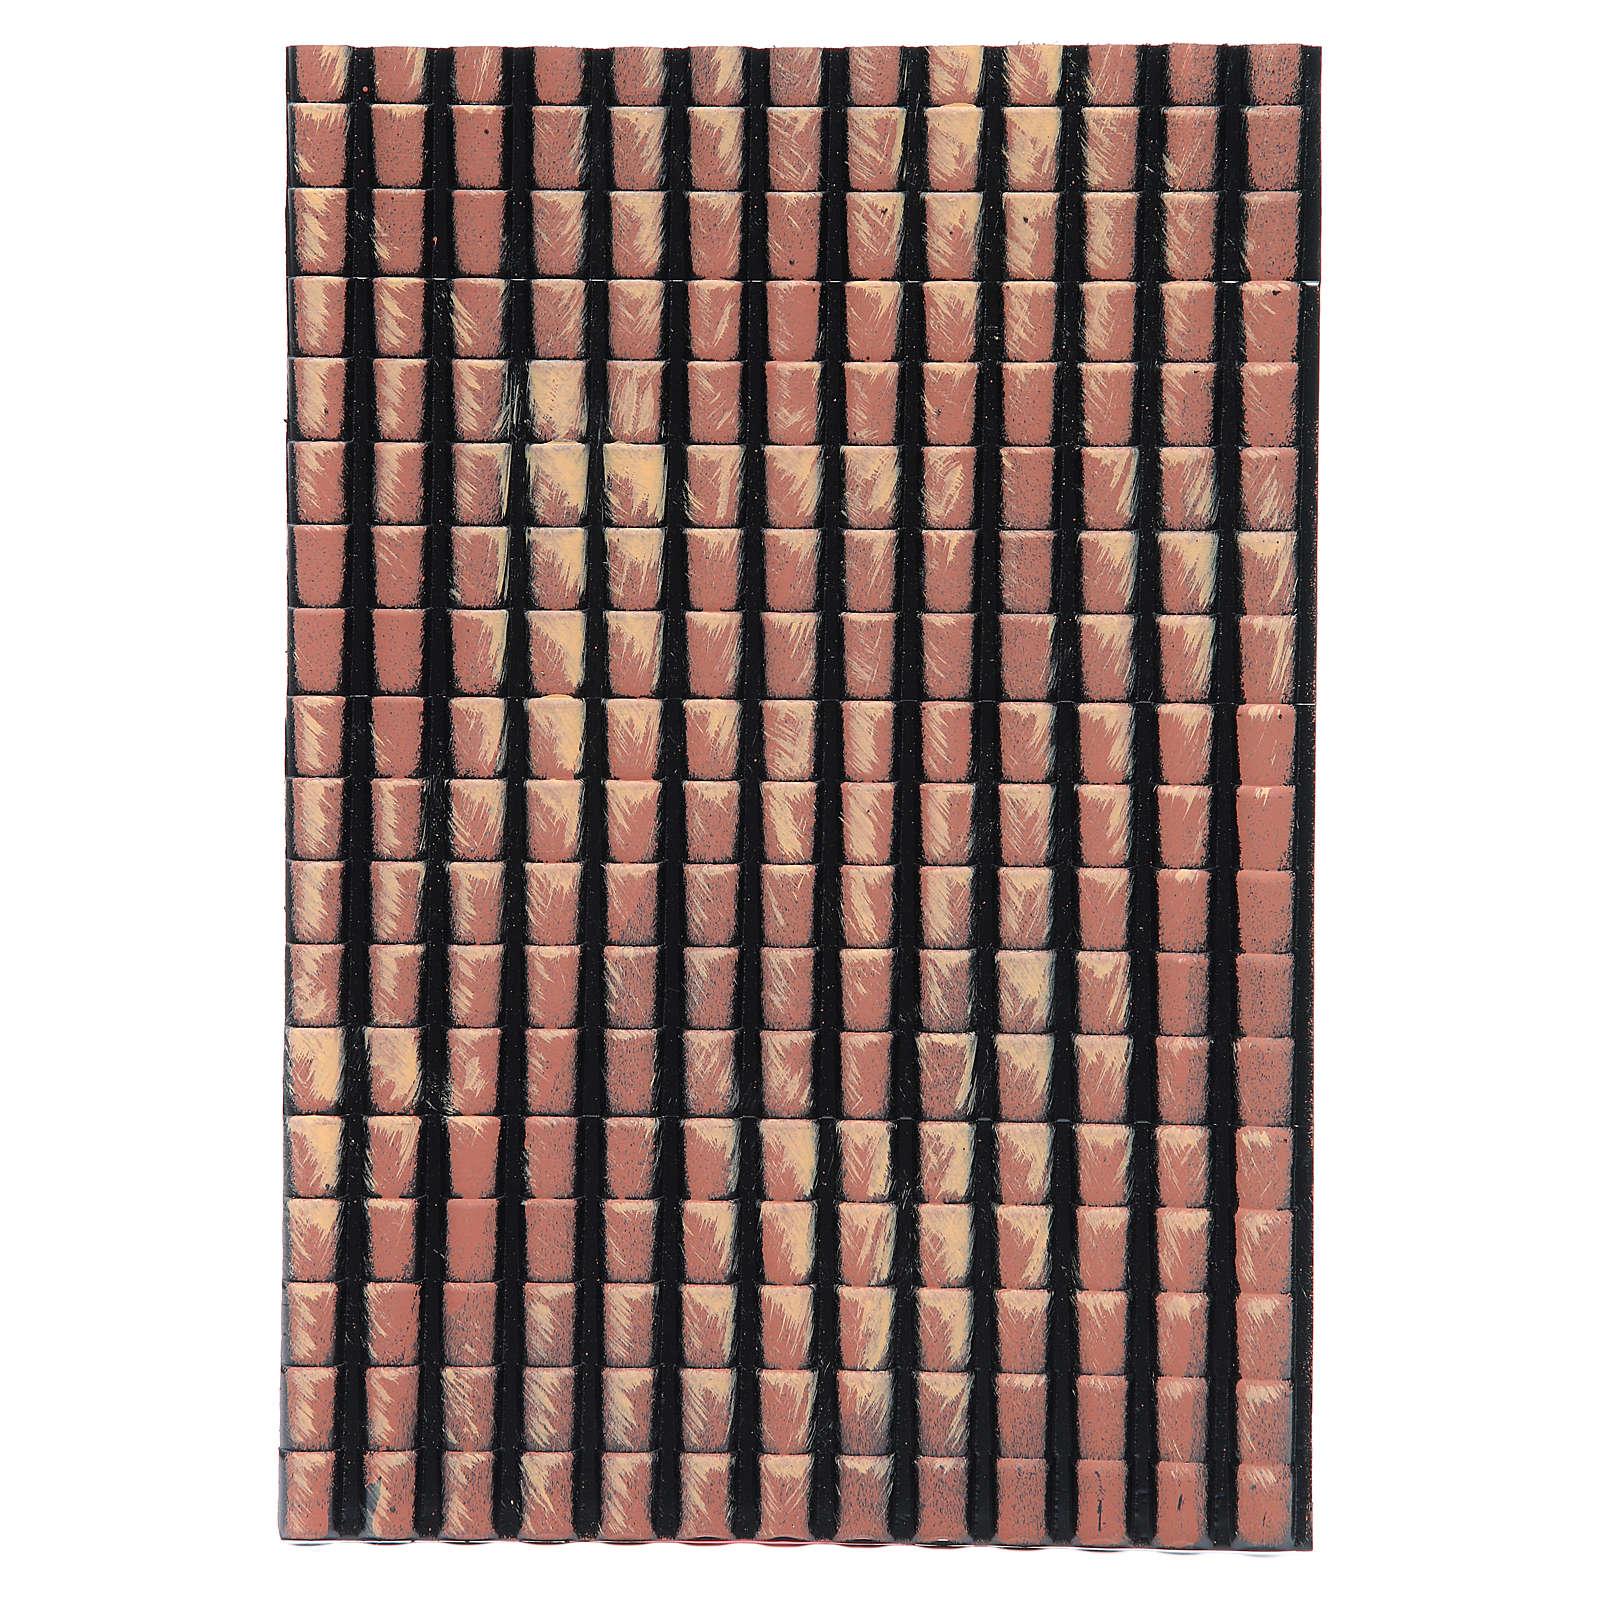 Pannello tetto presepe tegole rosse sfumate 35x25 cm 4